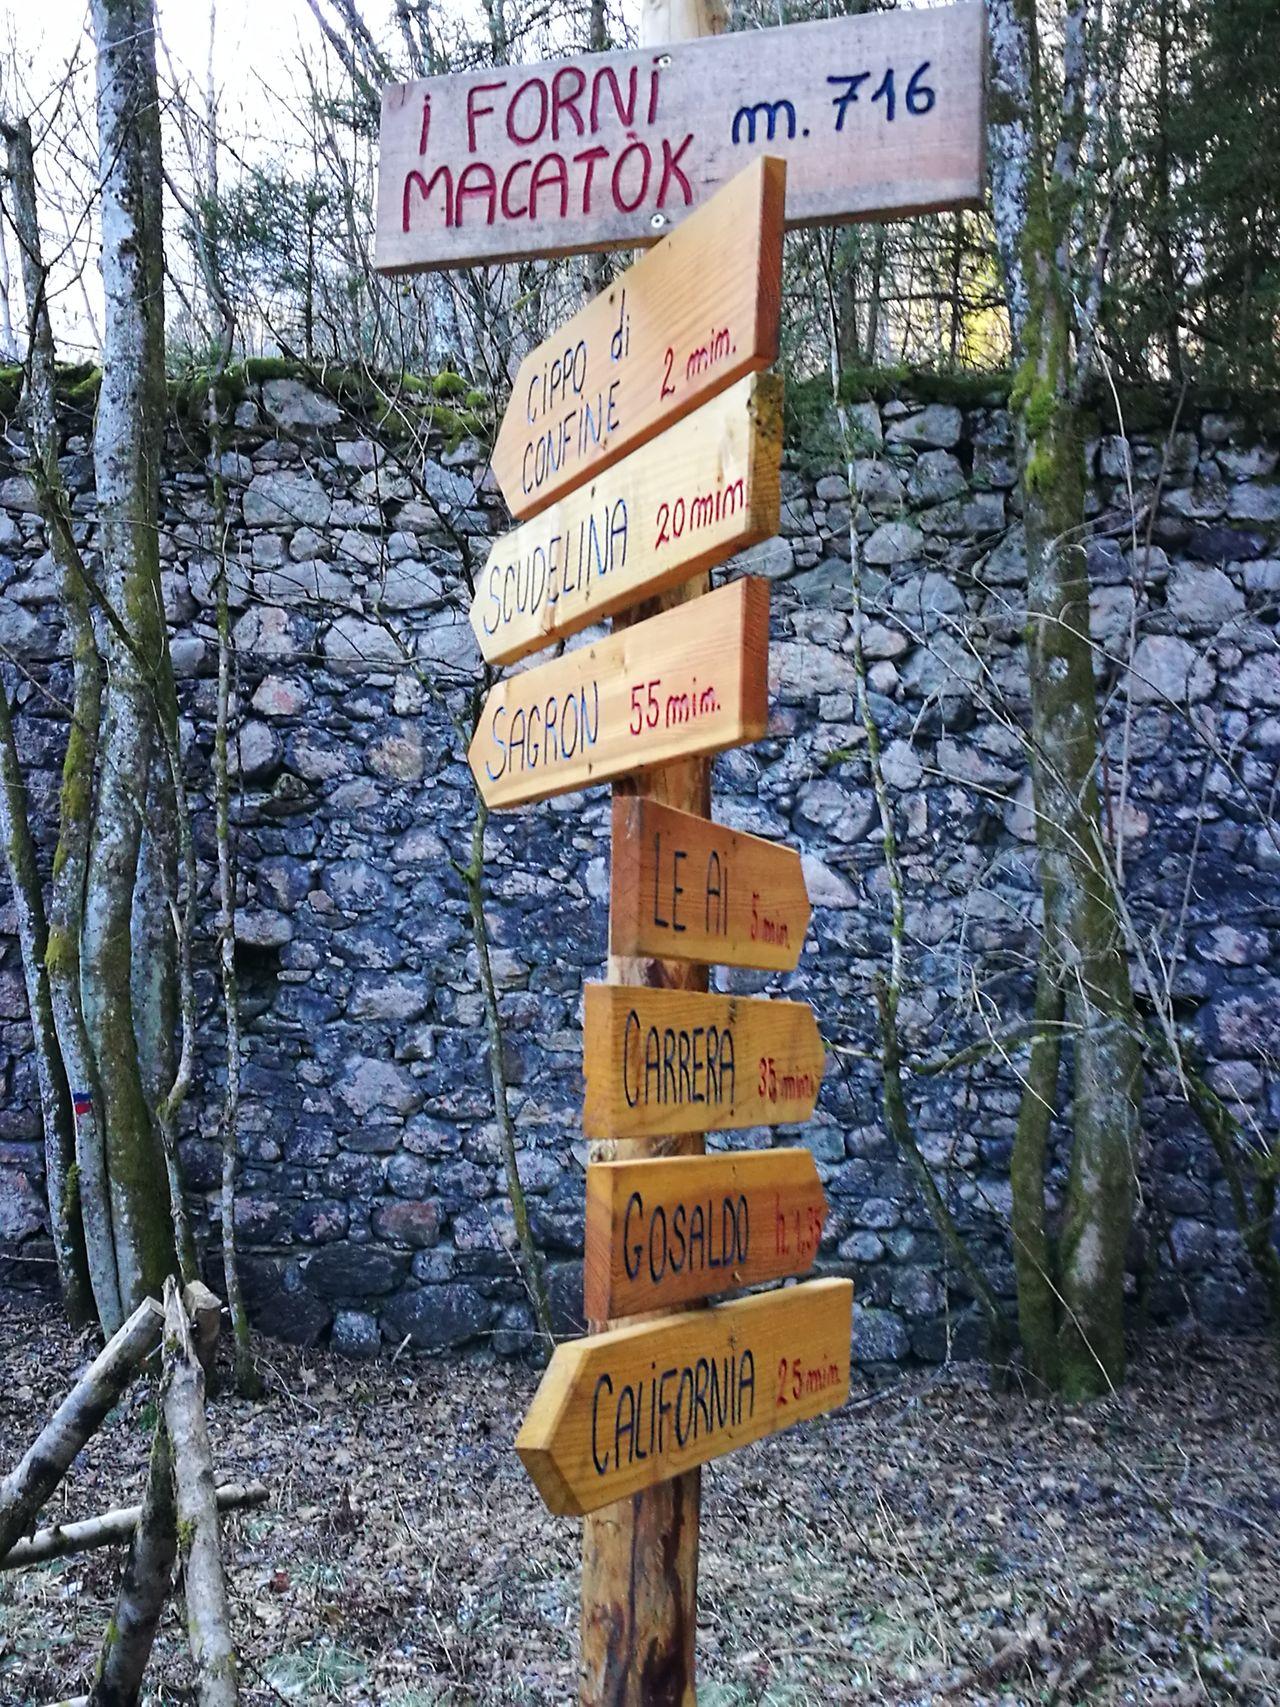 Dolomites, Italy Gosaldo California Paths Outdoors Nature Adventure